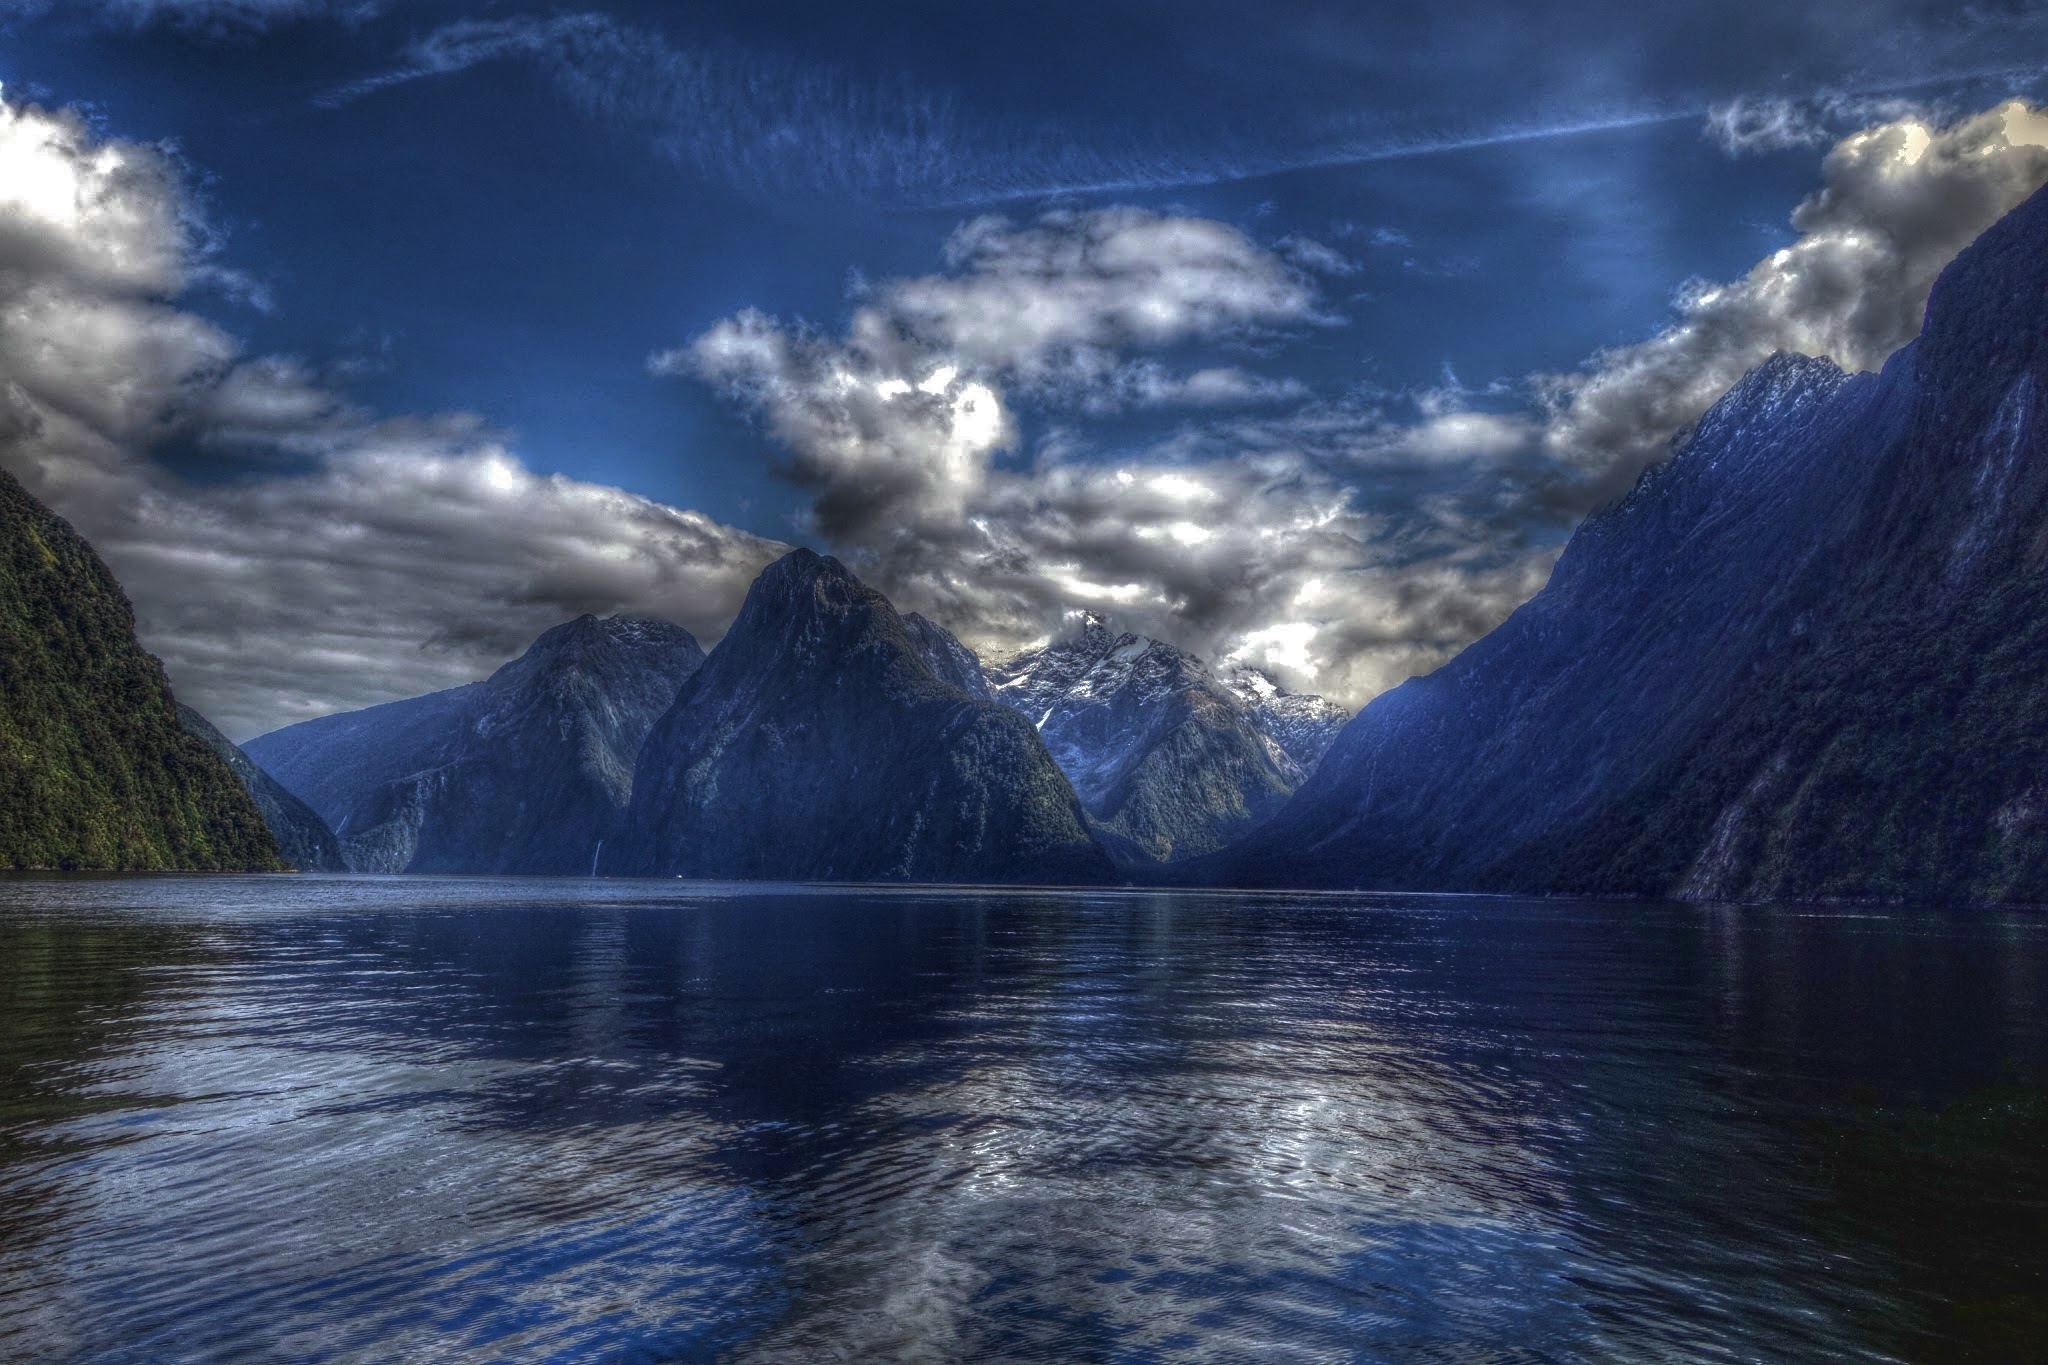 Mylfords Sound ivo meier reise bergsucht berge